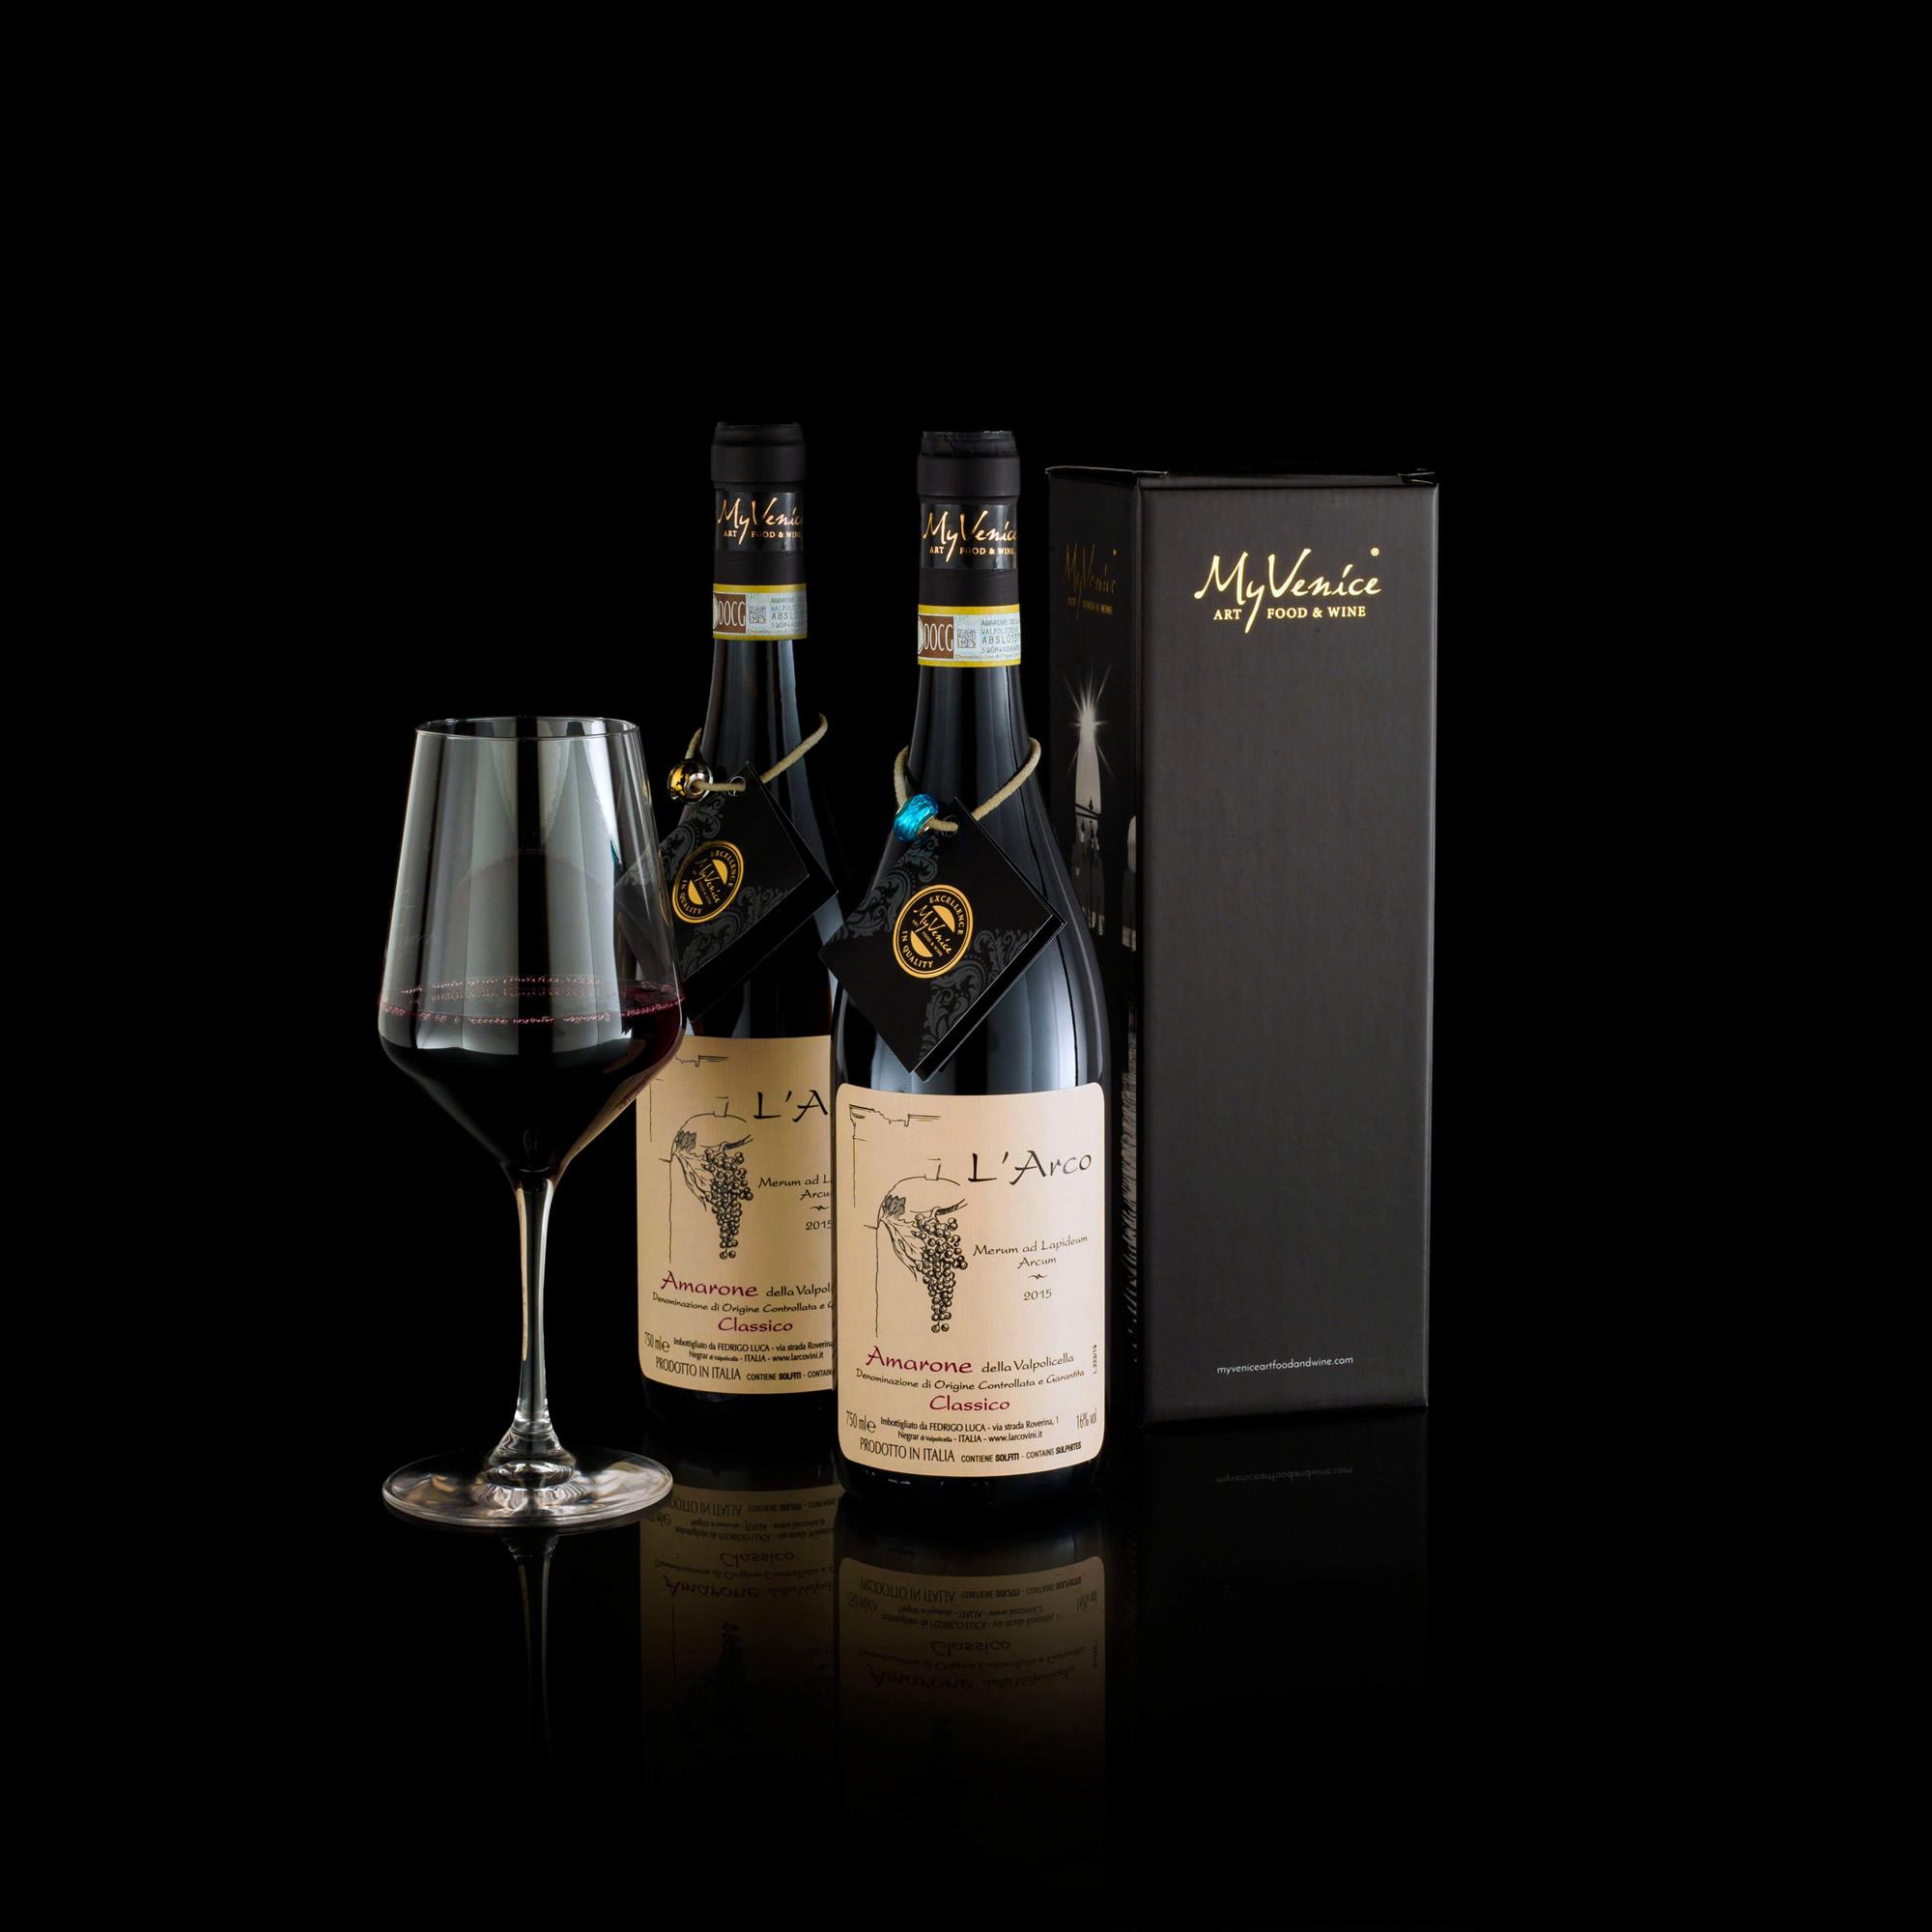 My Venice - Amarone wine